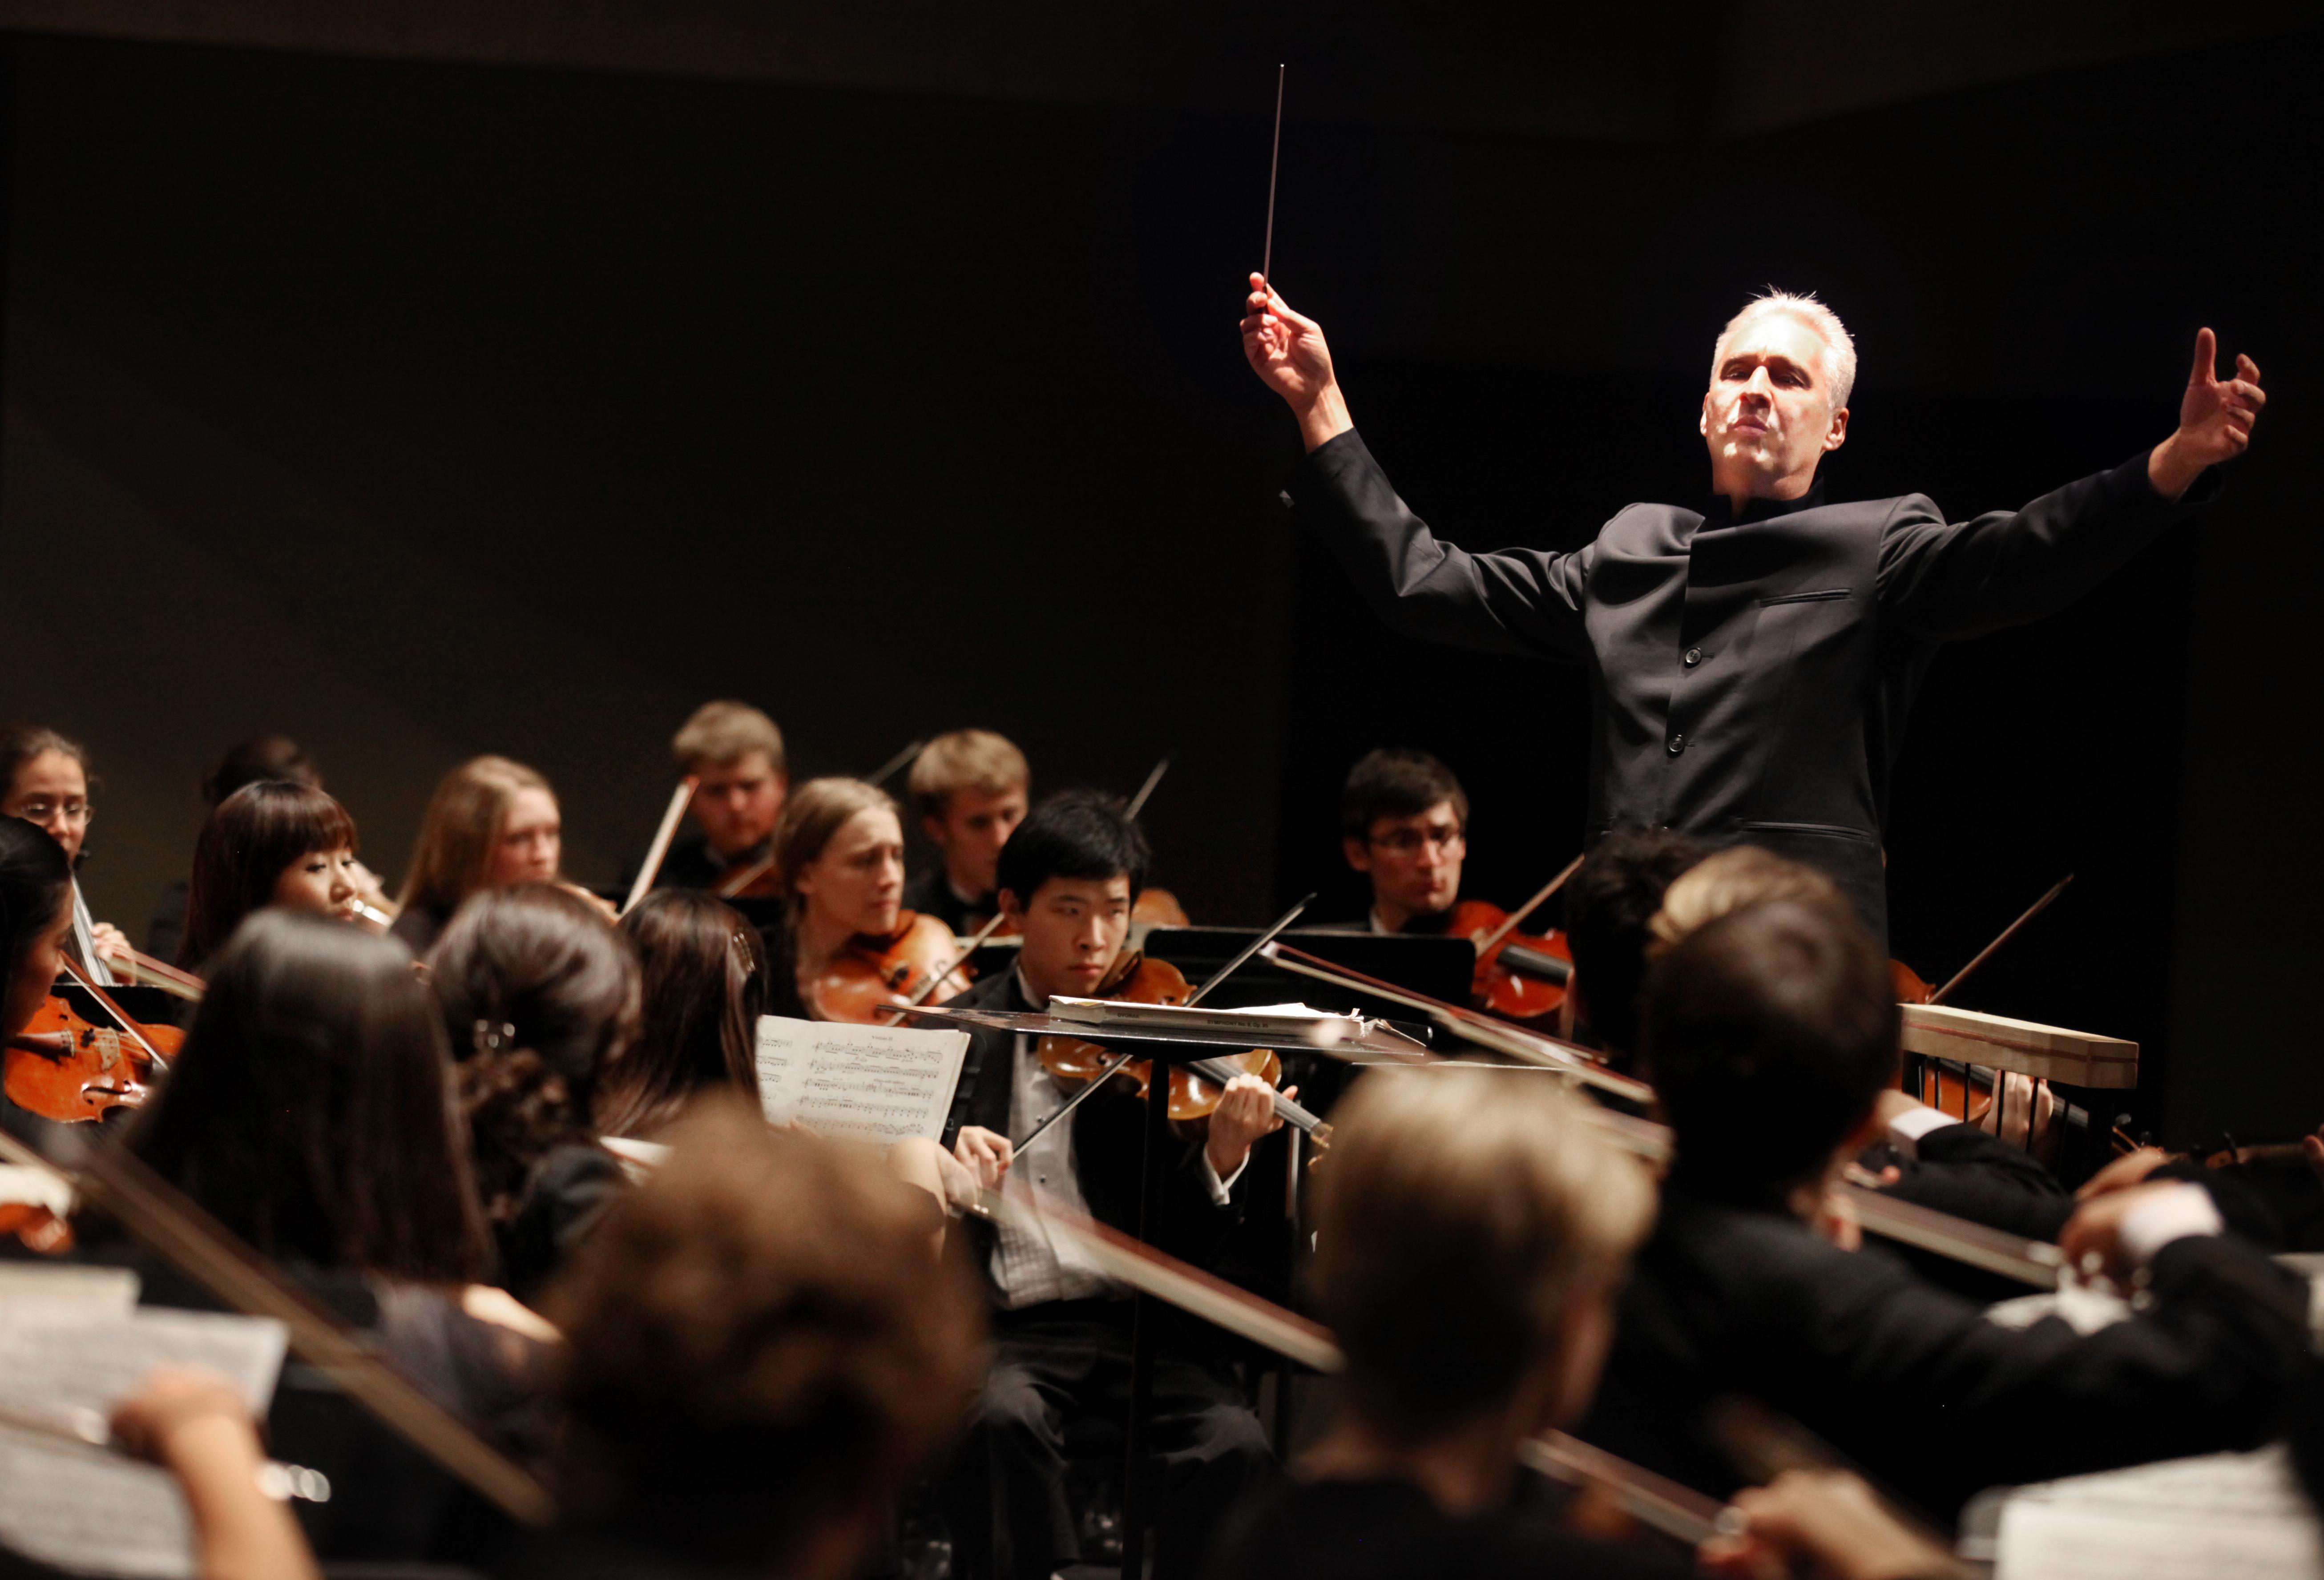 Vanderbilt University Orchestra closes season with Bartók thumbnail image